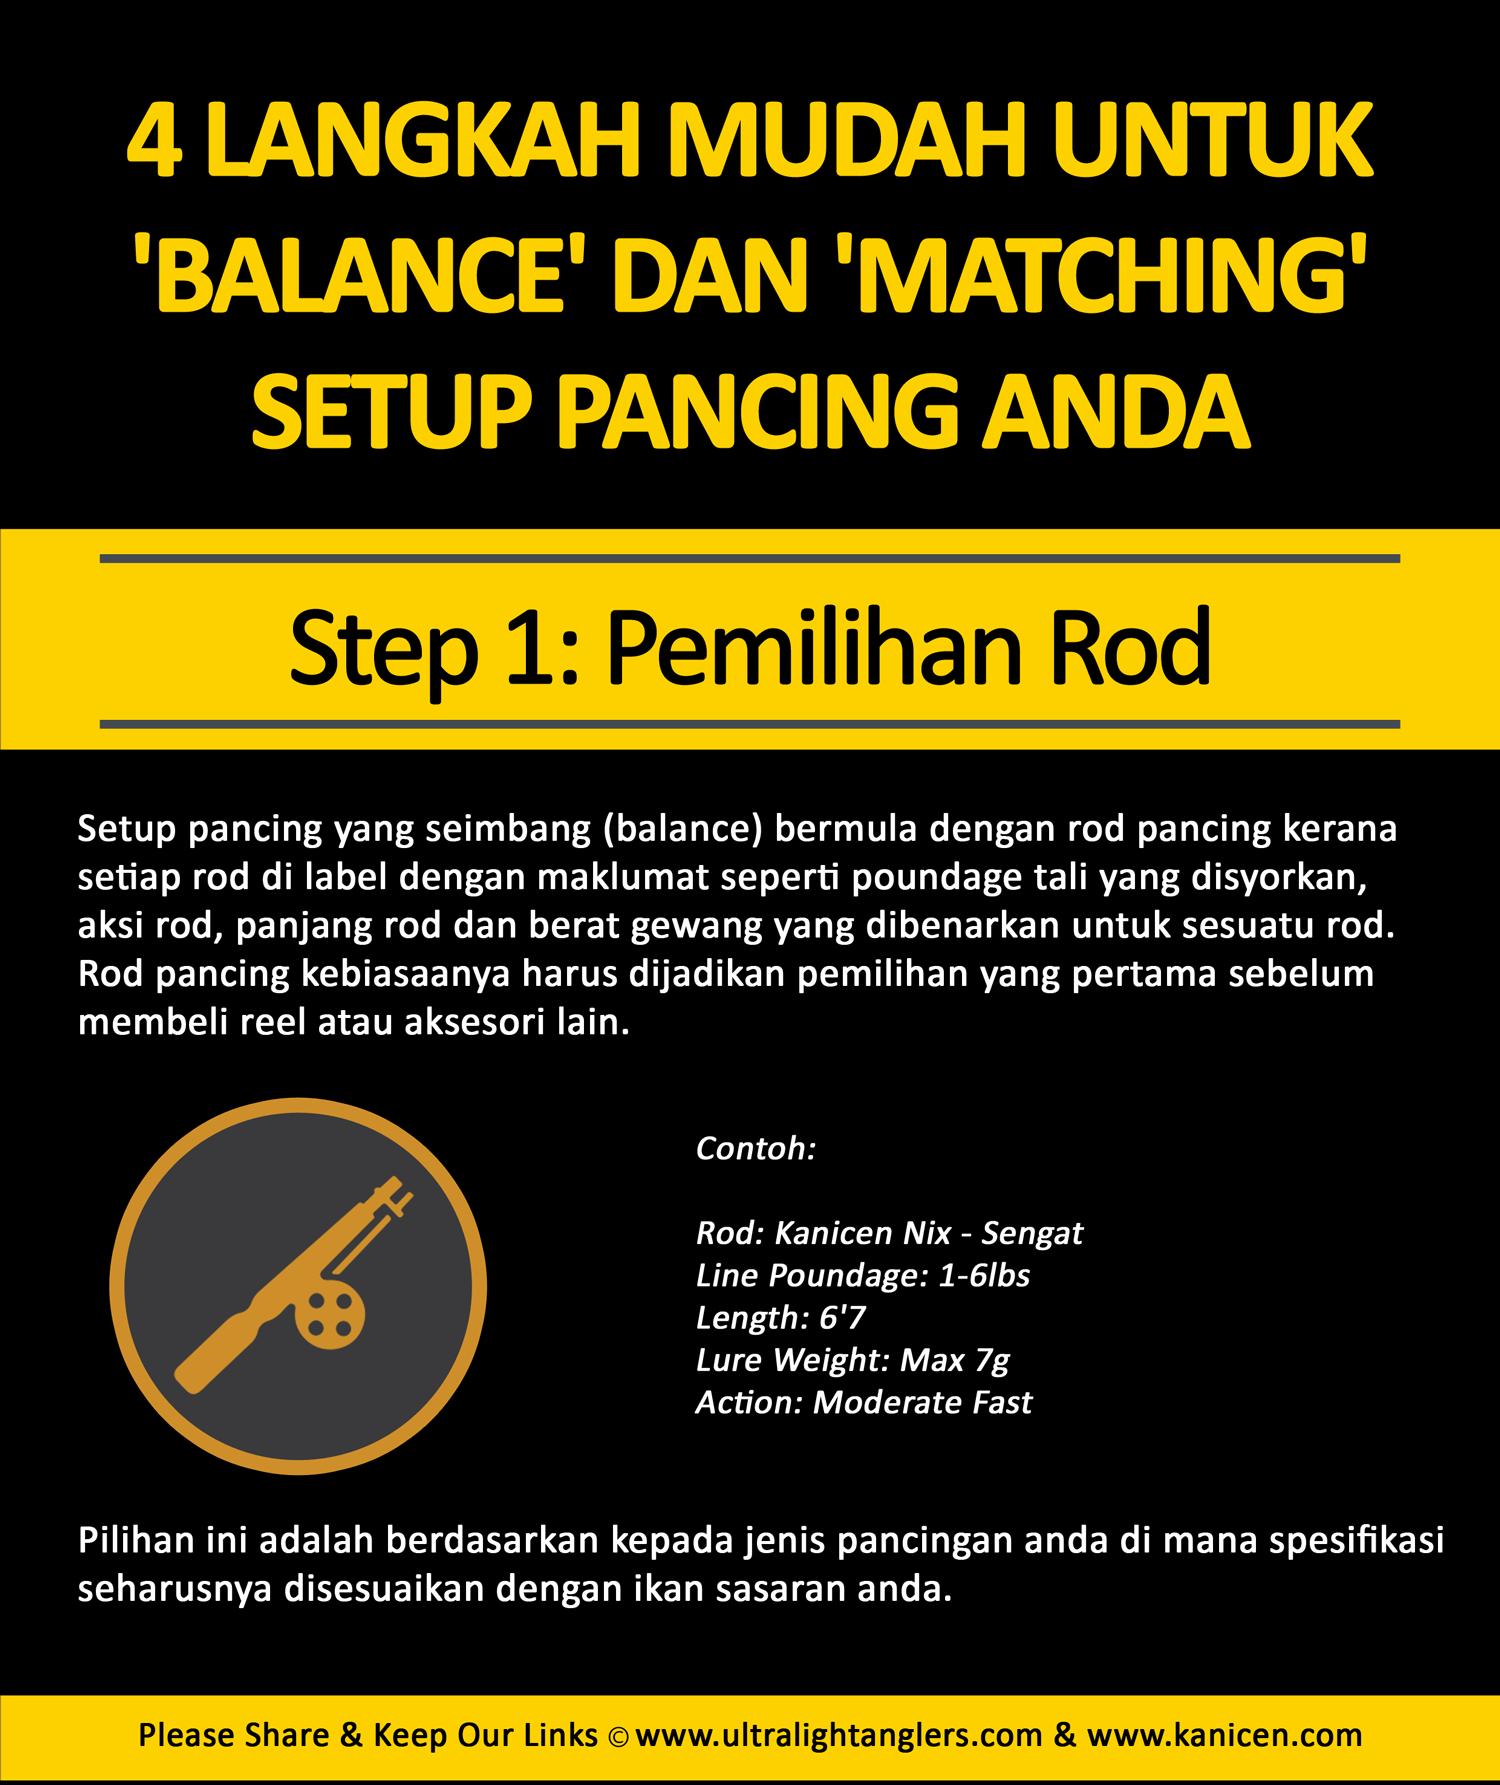 step-1-pemilihan-rod-4-Langkah-Mudah-Untuk-Balance-dan-Matching-Setup-Pancing-Anda